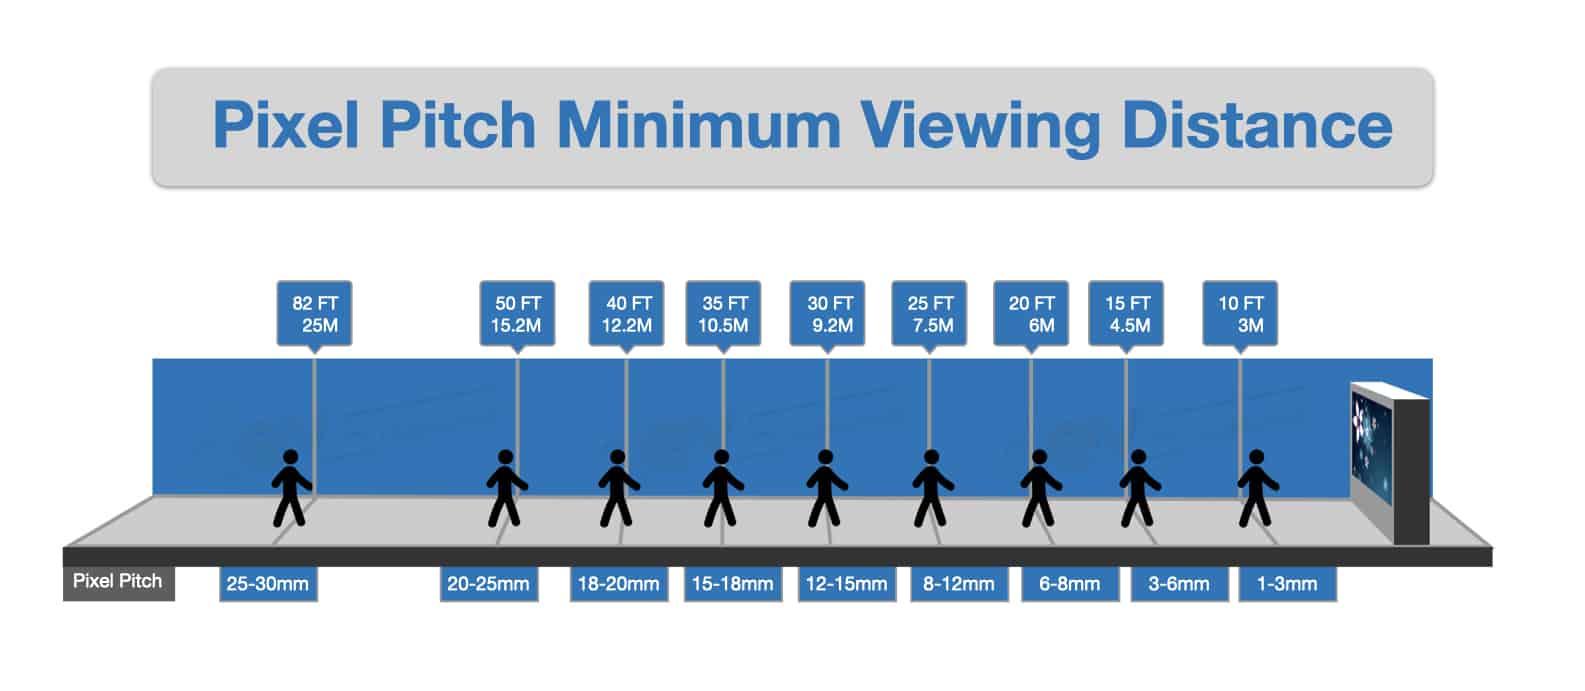 Pixel pitch minimum viewing distance